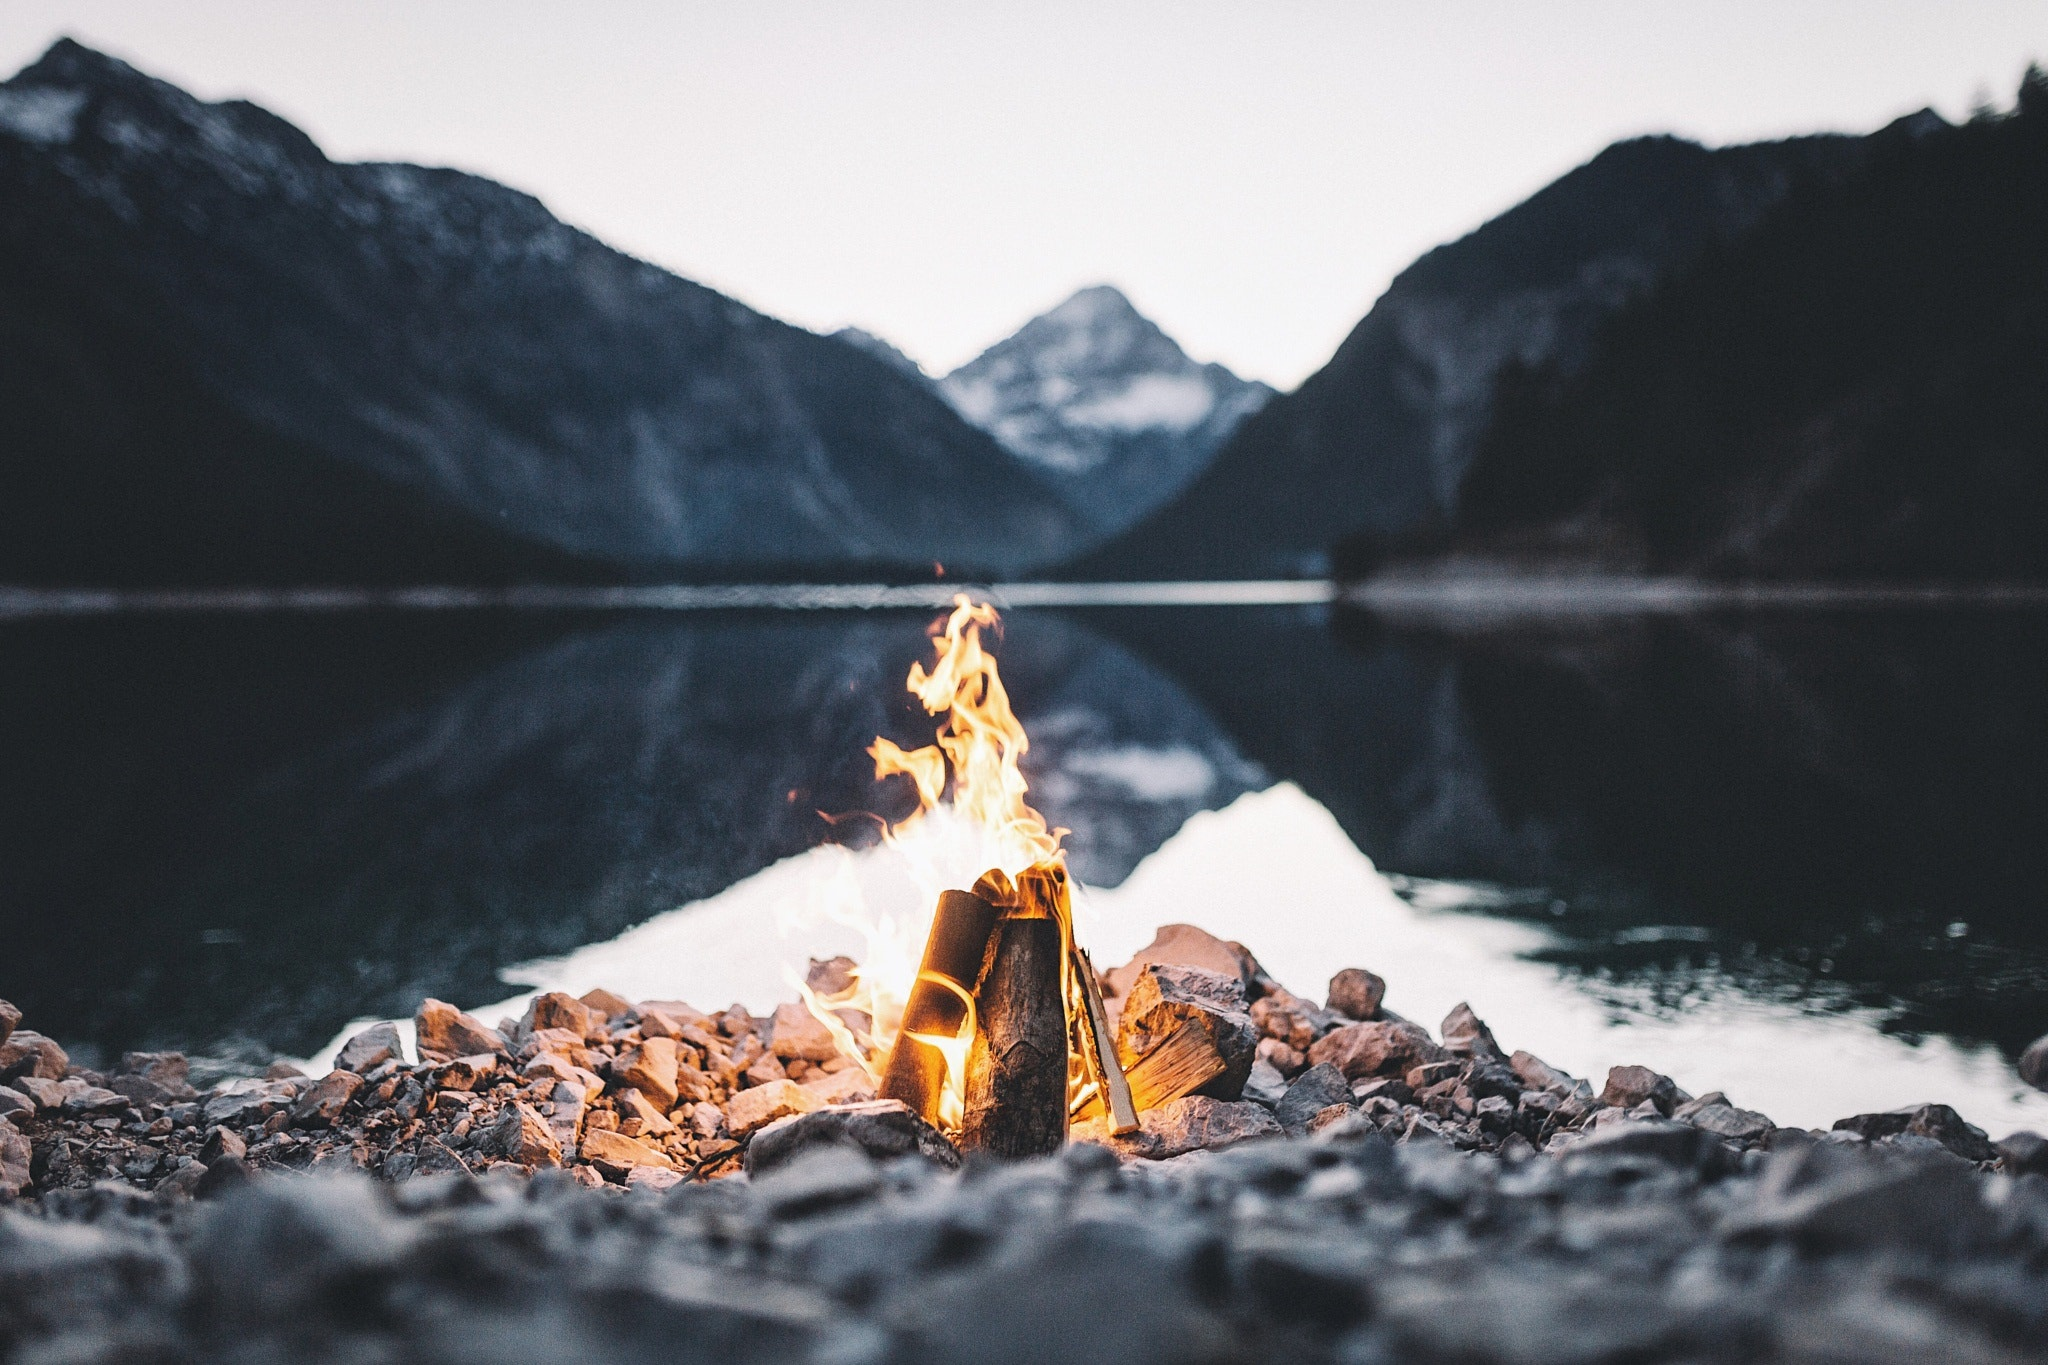 Пара на берегу горного озера  № 1608977 бесплатно